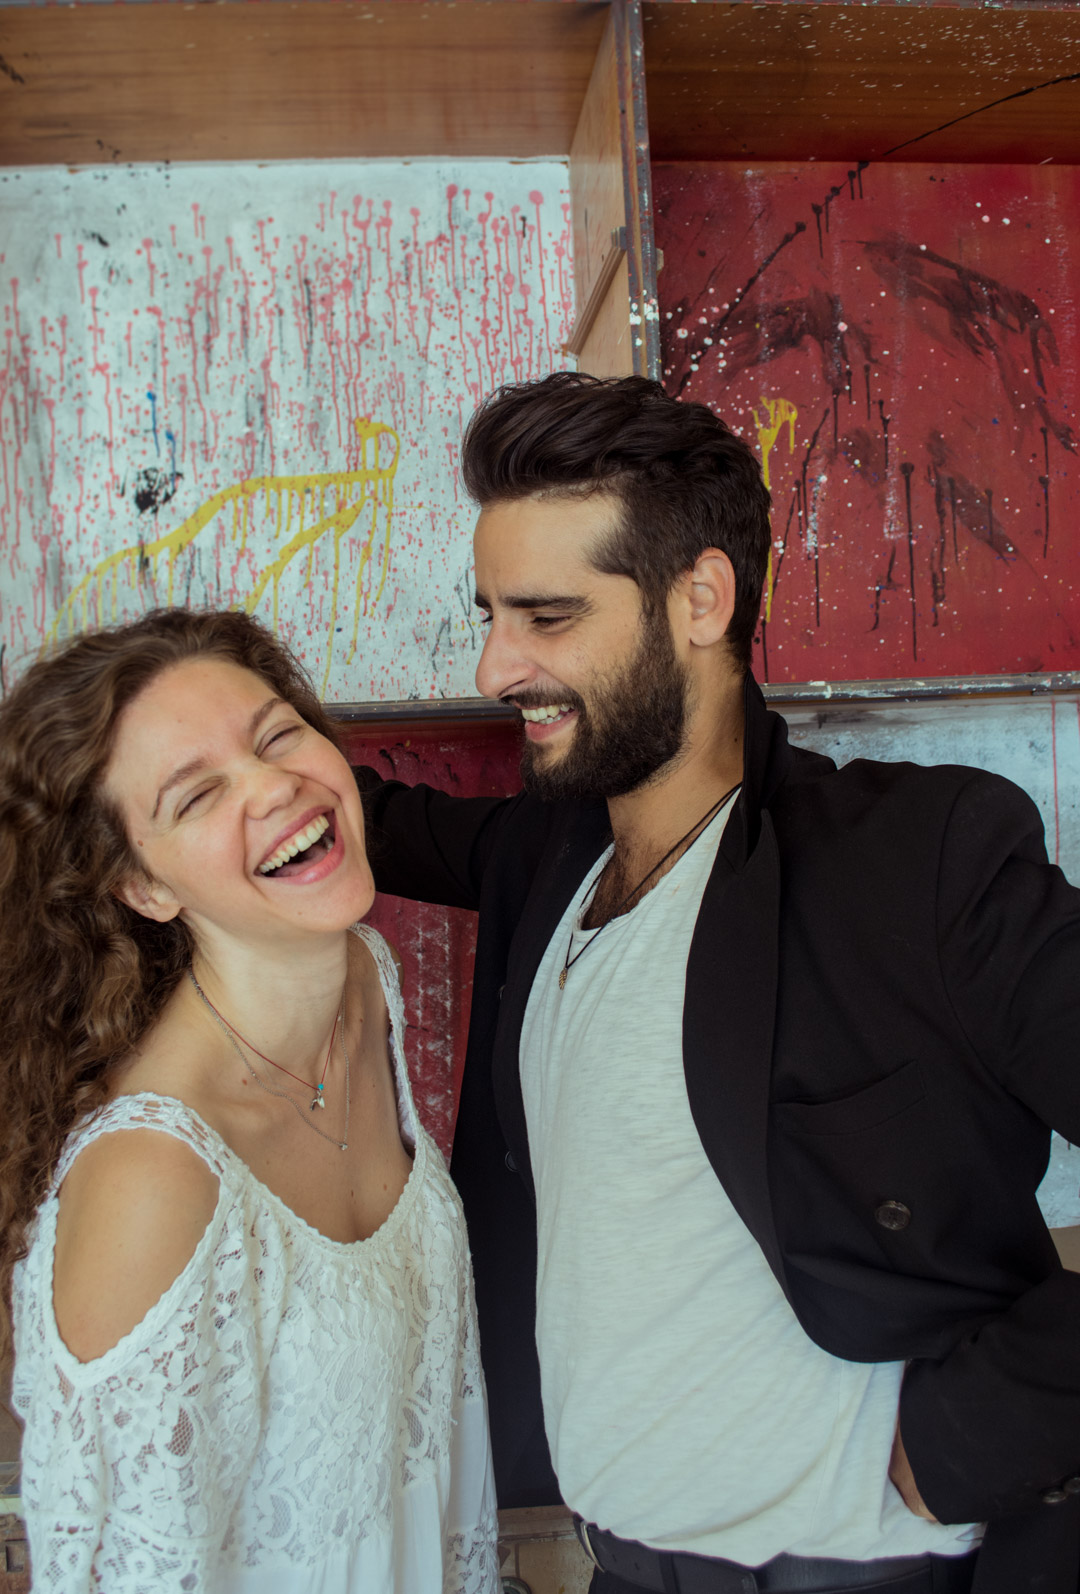 dating με ΑμεΑ χώρα dating σε απευθείας σύνδεση